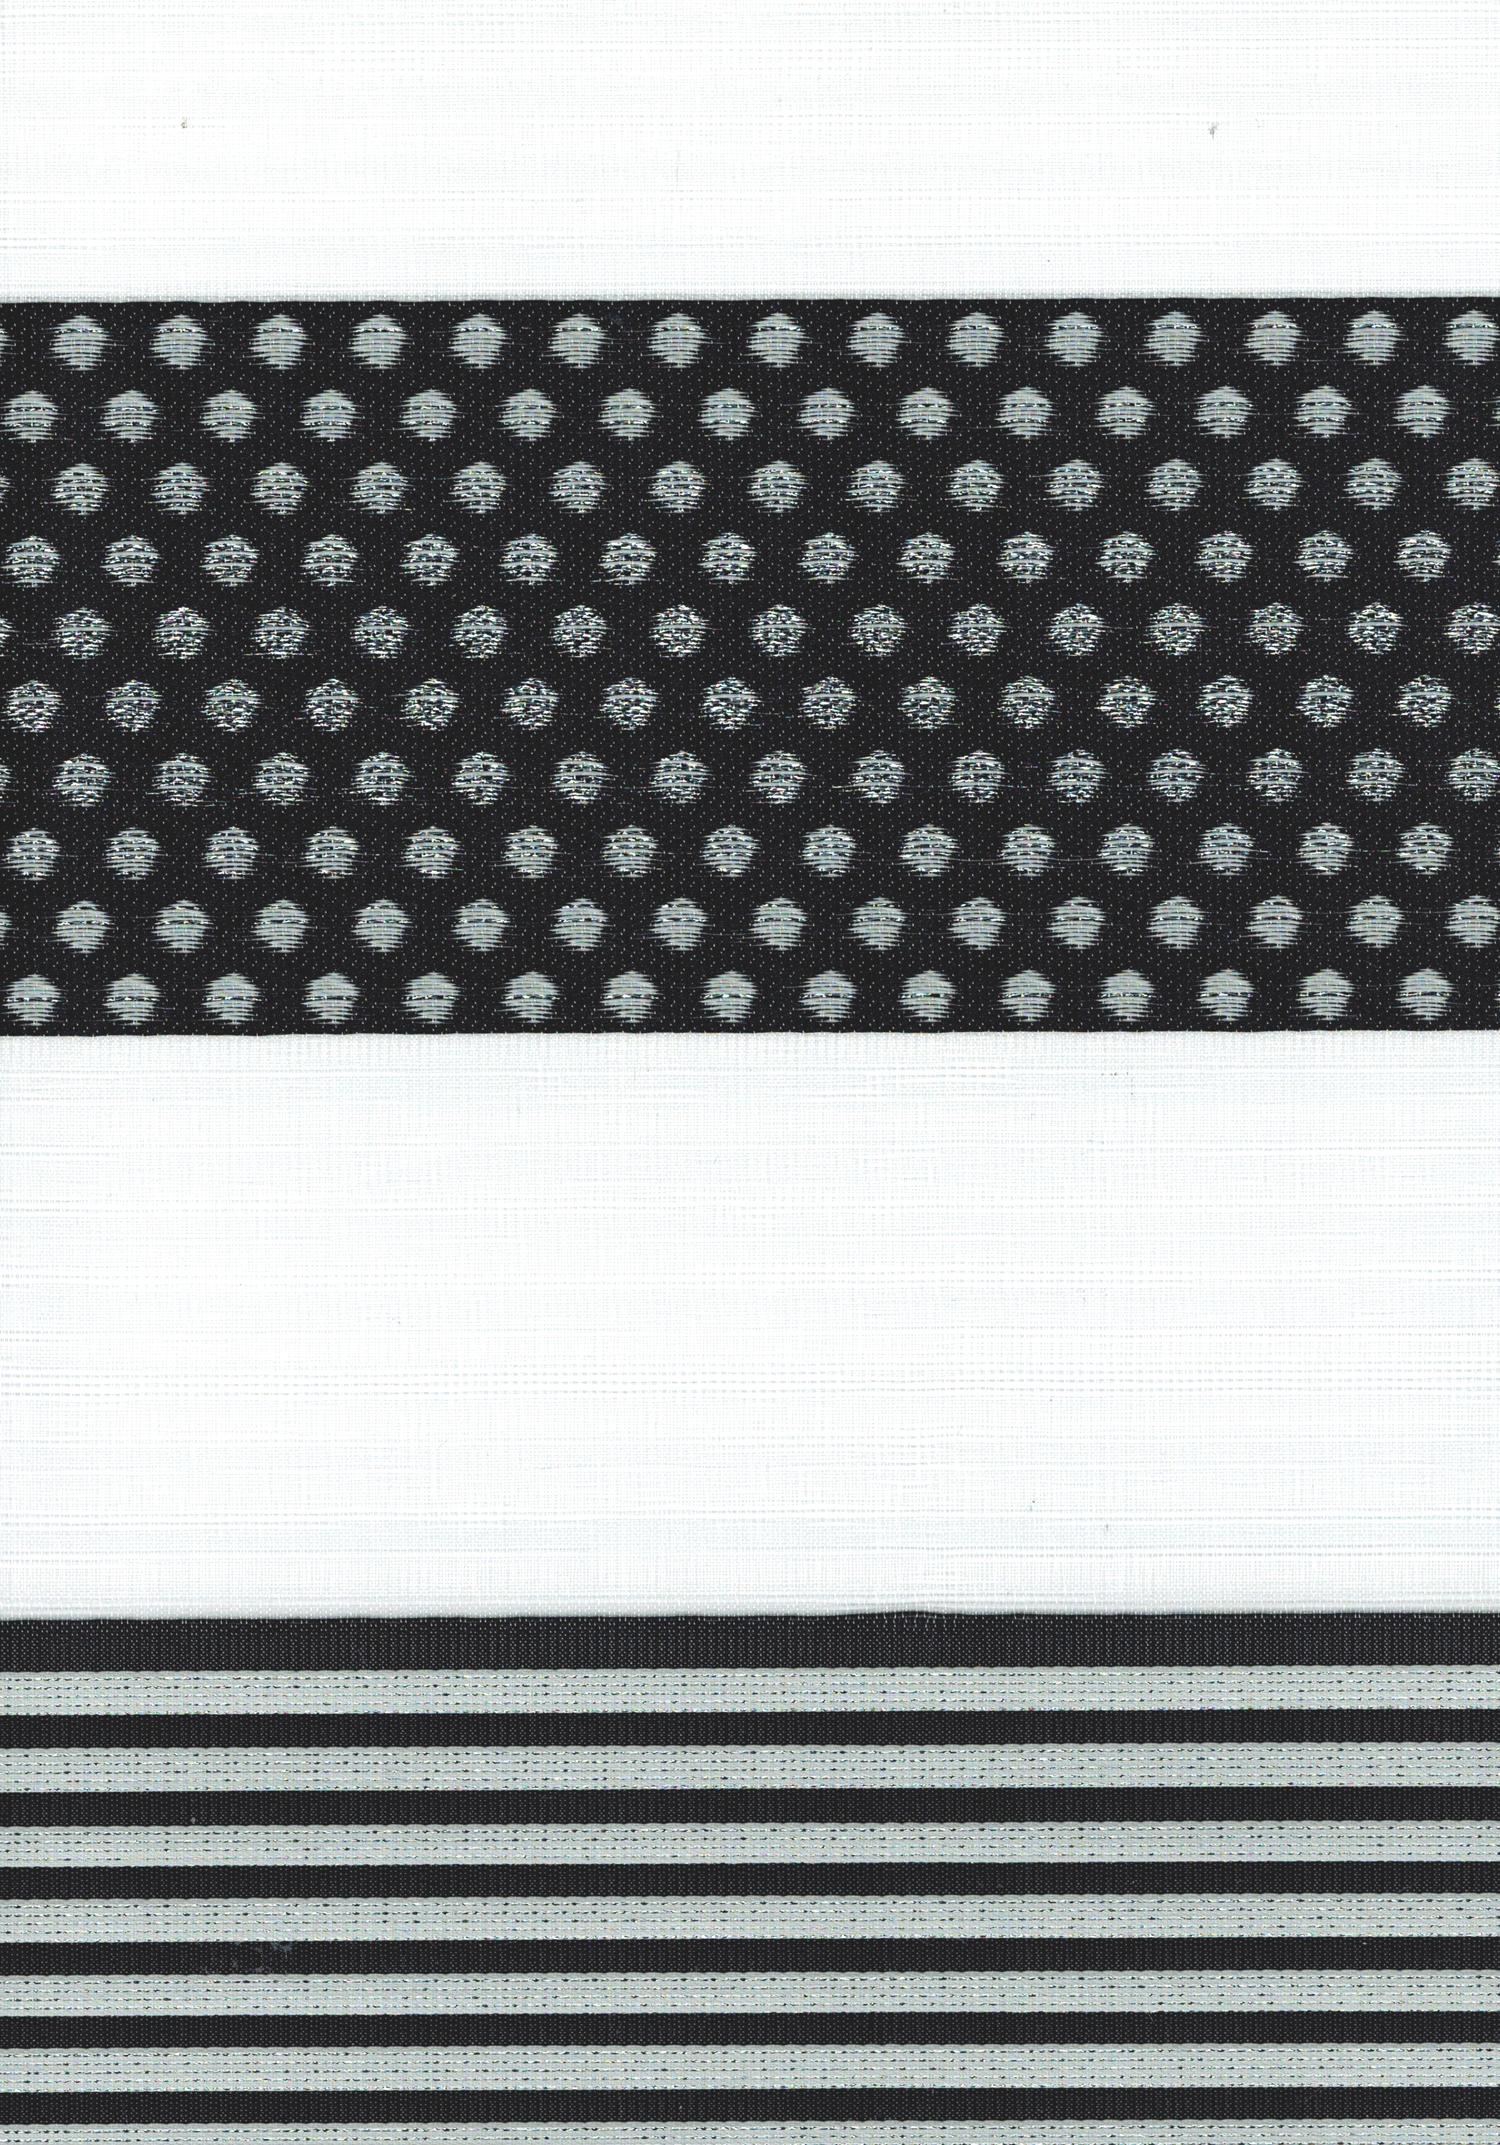 doppelrollo schwarz free doppelrollo with doppelrollo schwarz farben der im detail with. Black Bedroom Furniture Sets. Home Design Ideas